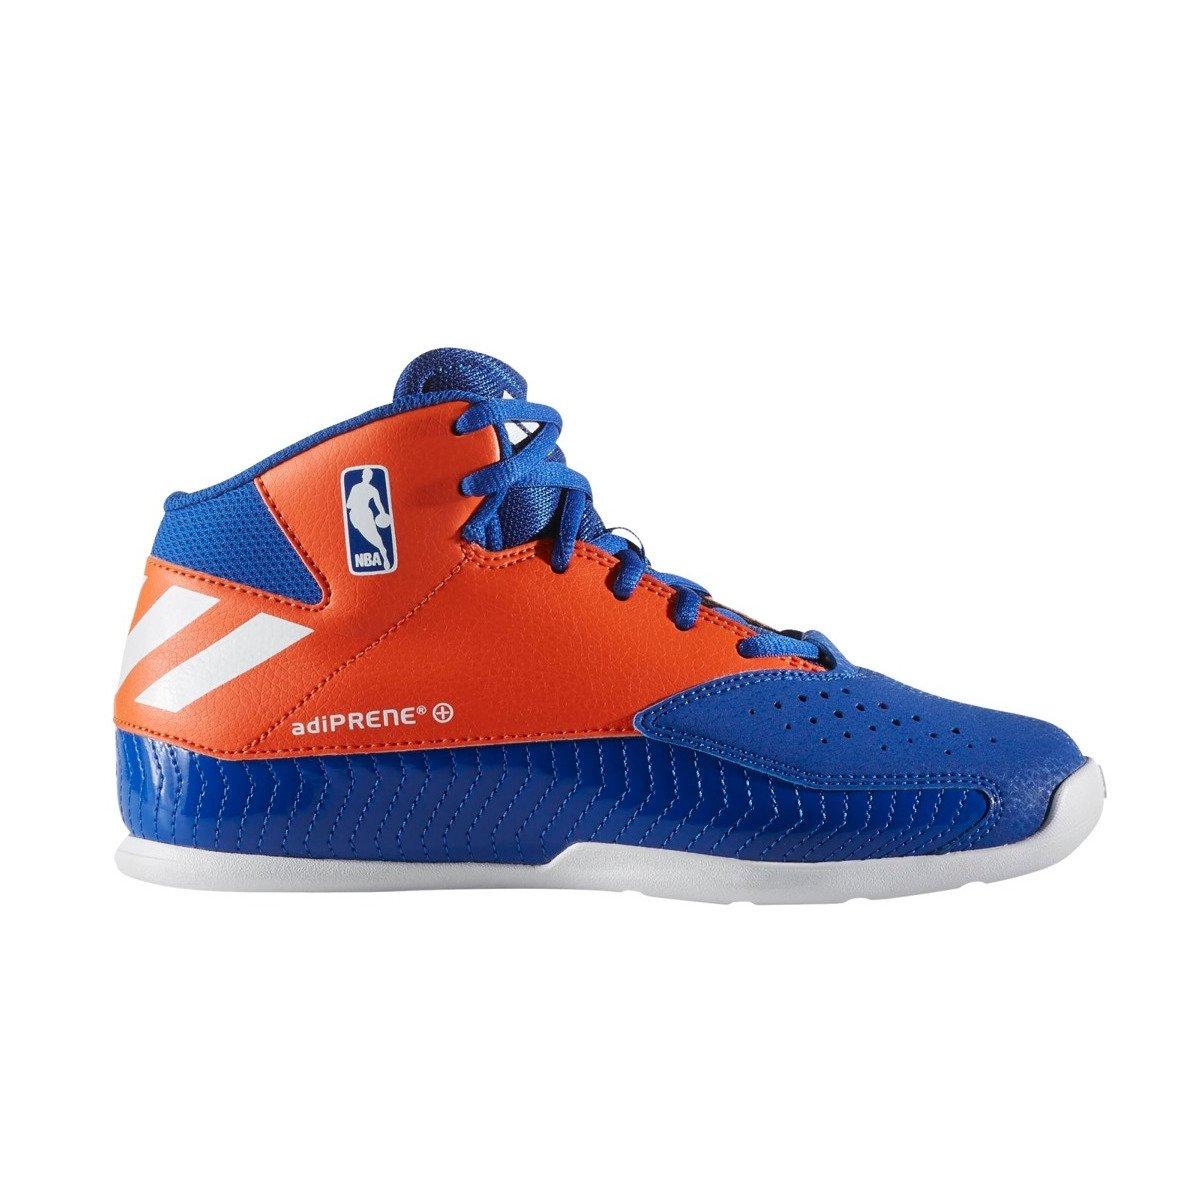 Adidas Next Level Speed 5 NBA Schuhe